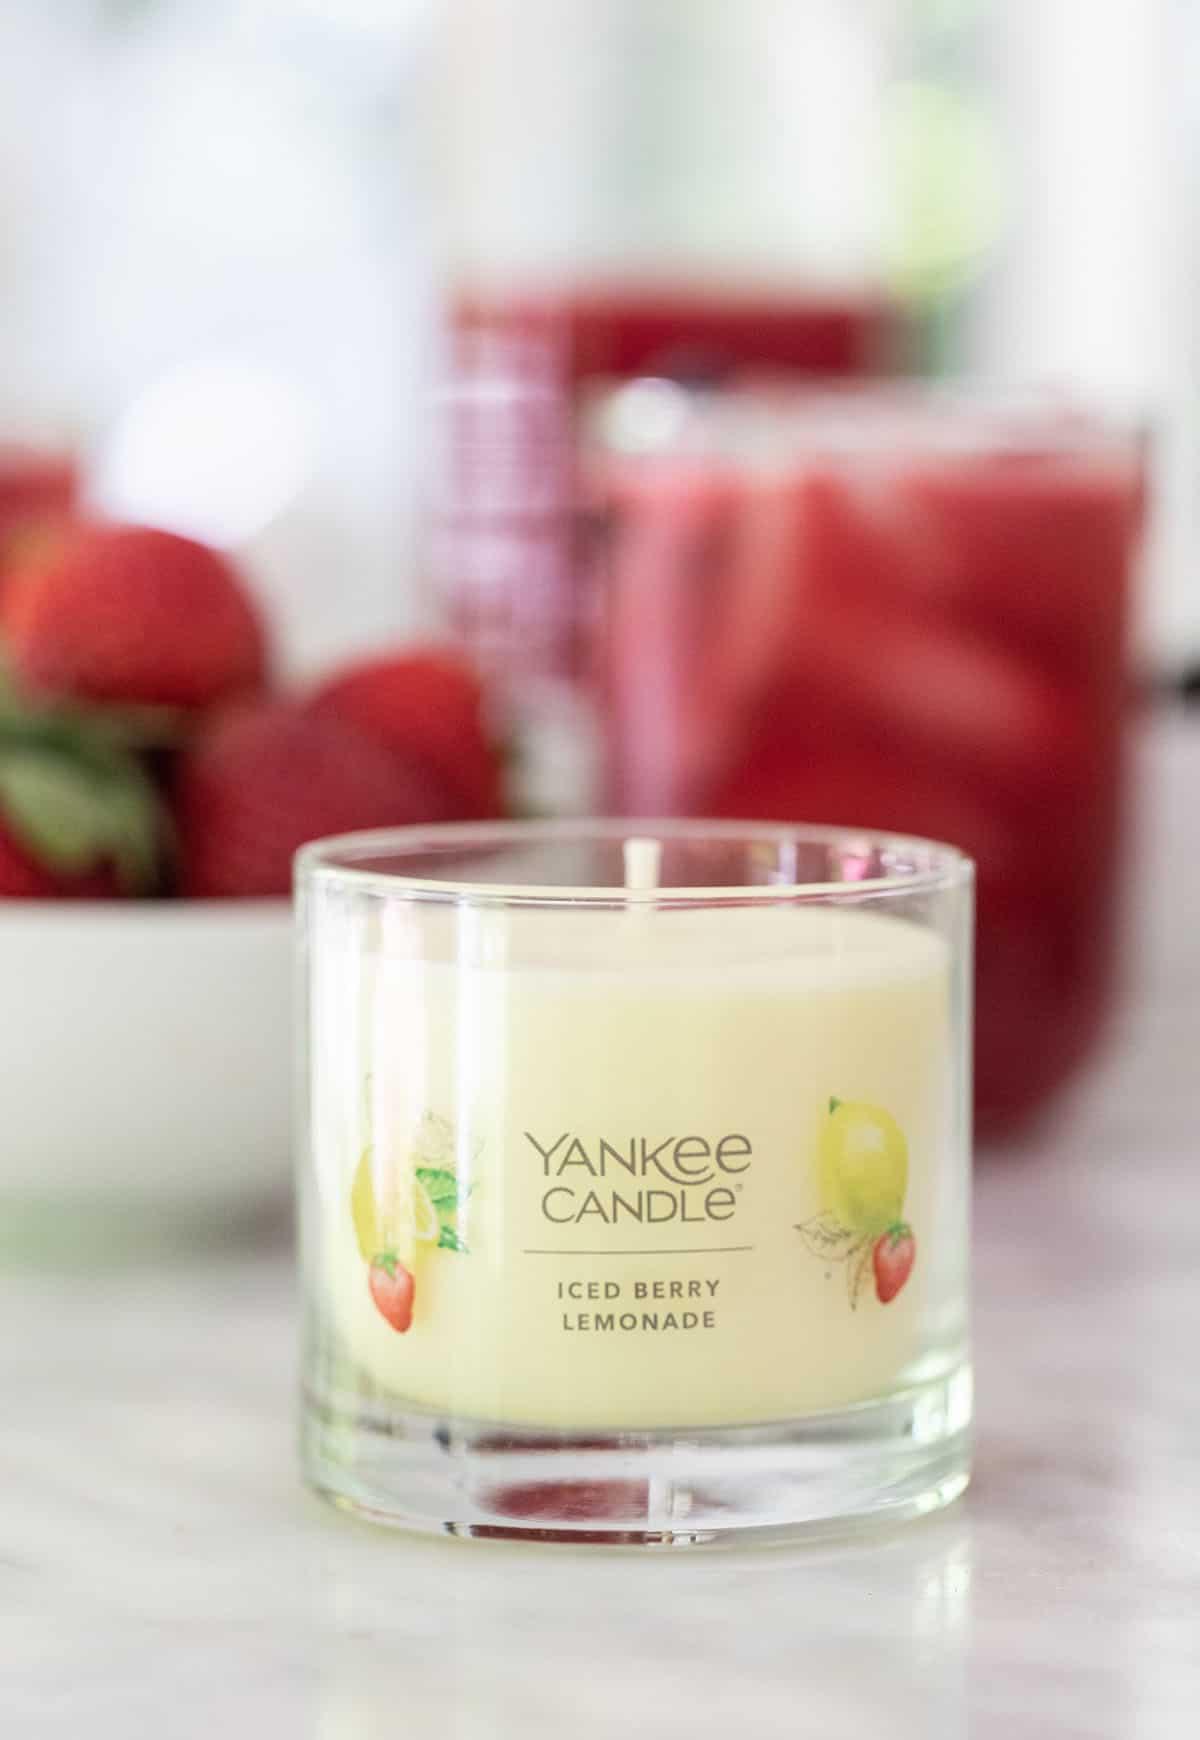 Yankee Candle Iced Berry Lemonade